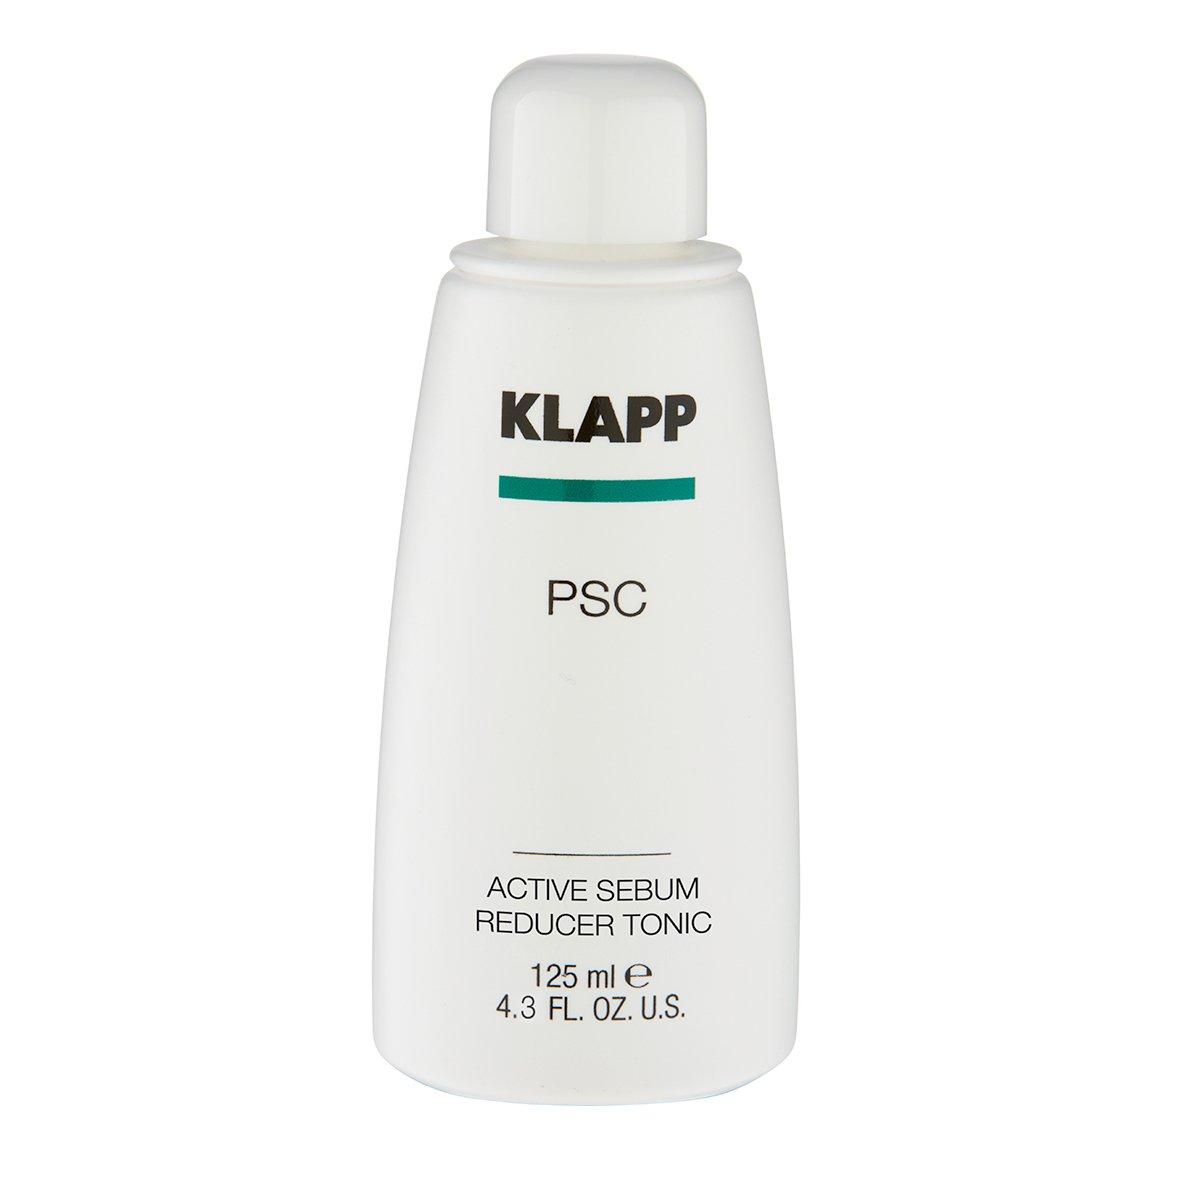 Klapp PSC Active Sebum Reducer 125 ml 1114